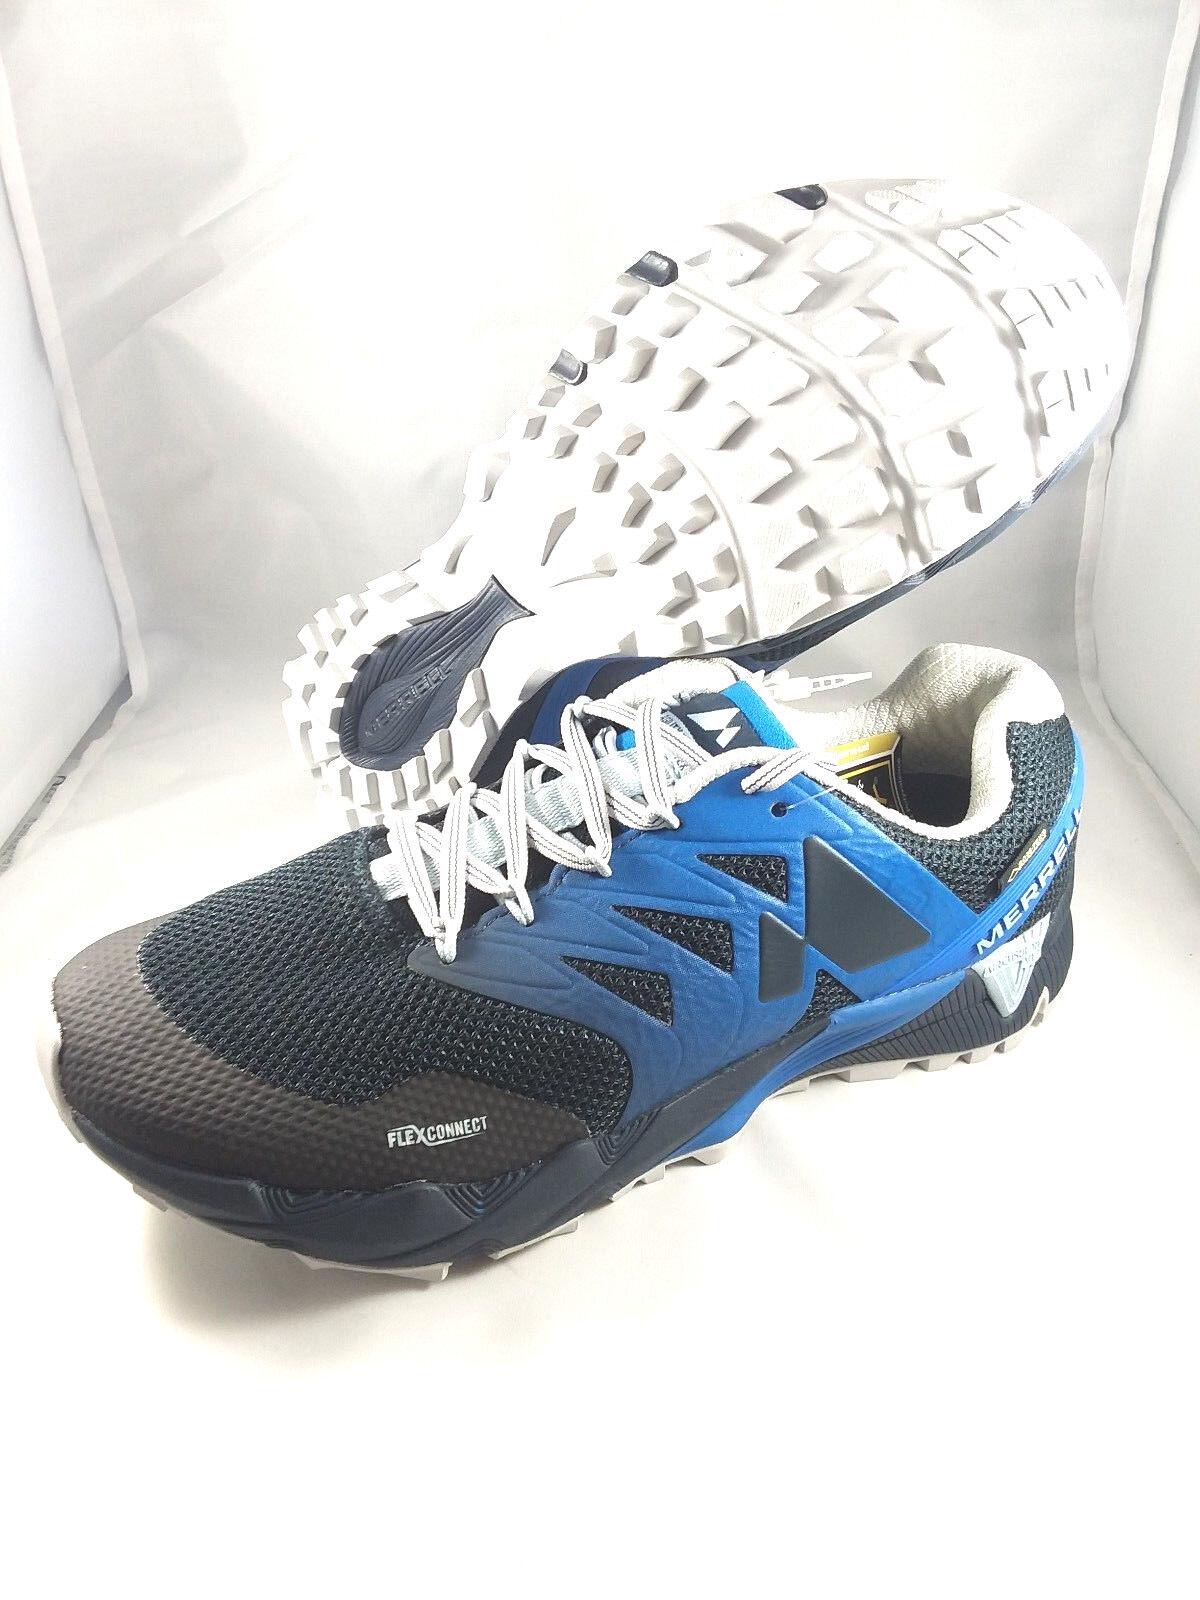 Merrell Agility Peak Flex 2 GTX GoreTex Mens Trail bluee J598379 Retail